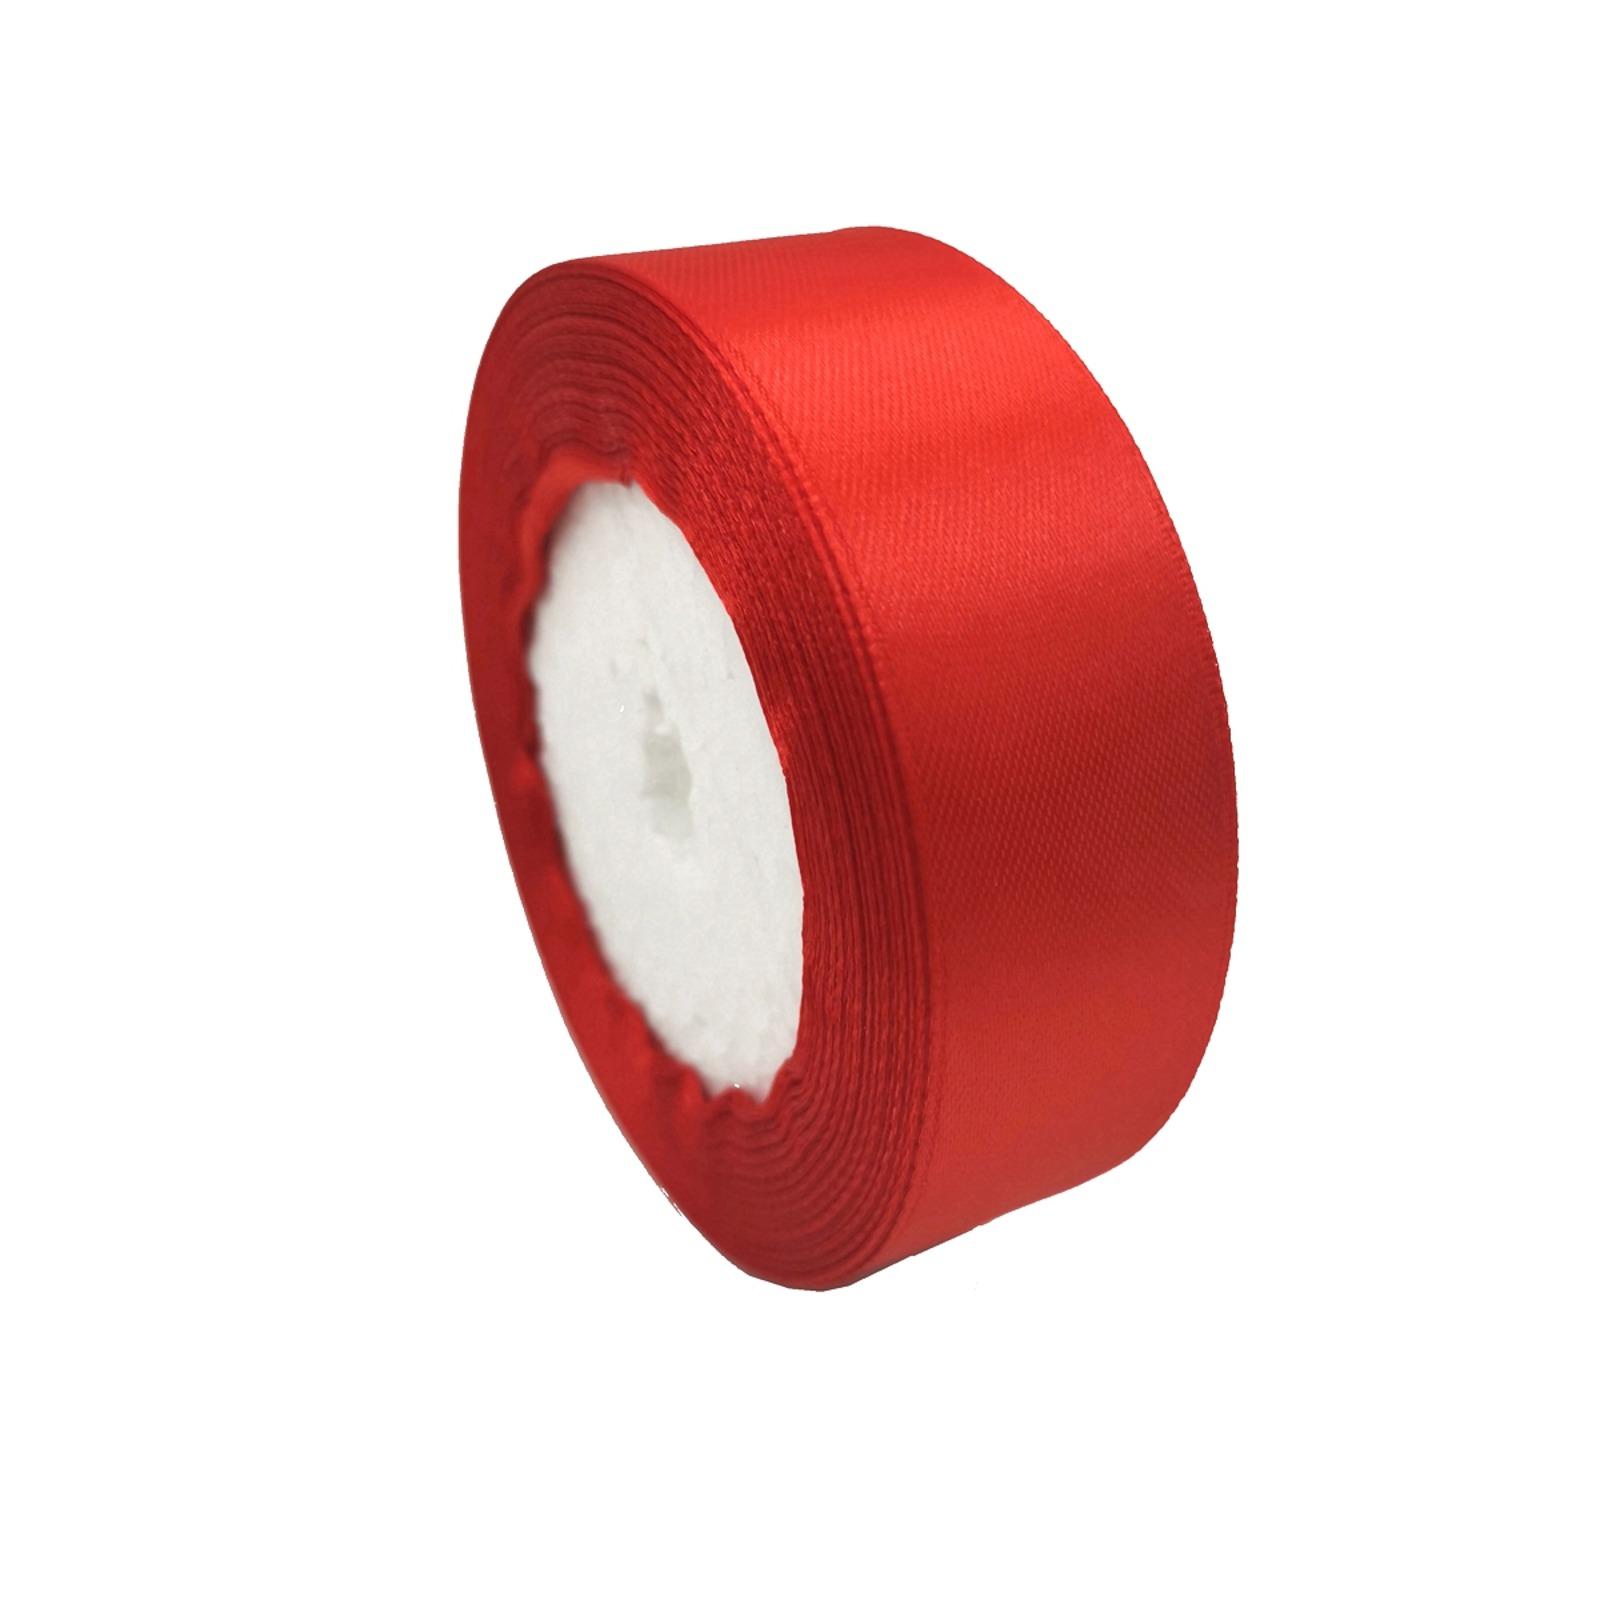 VIP Ribbon 2.5cm x 22.5m - Red